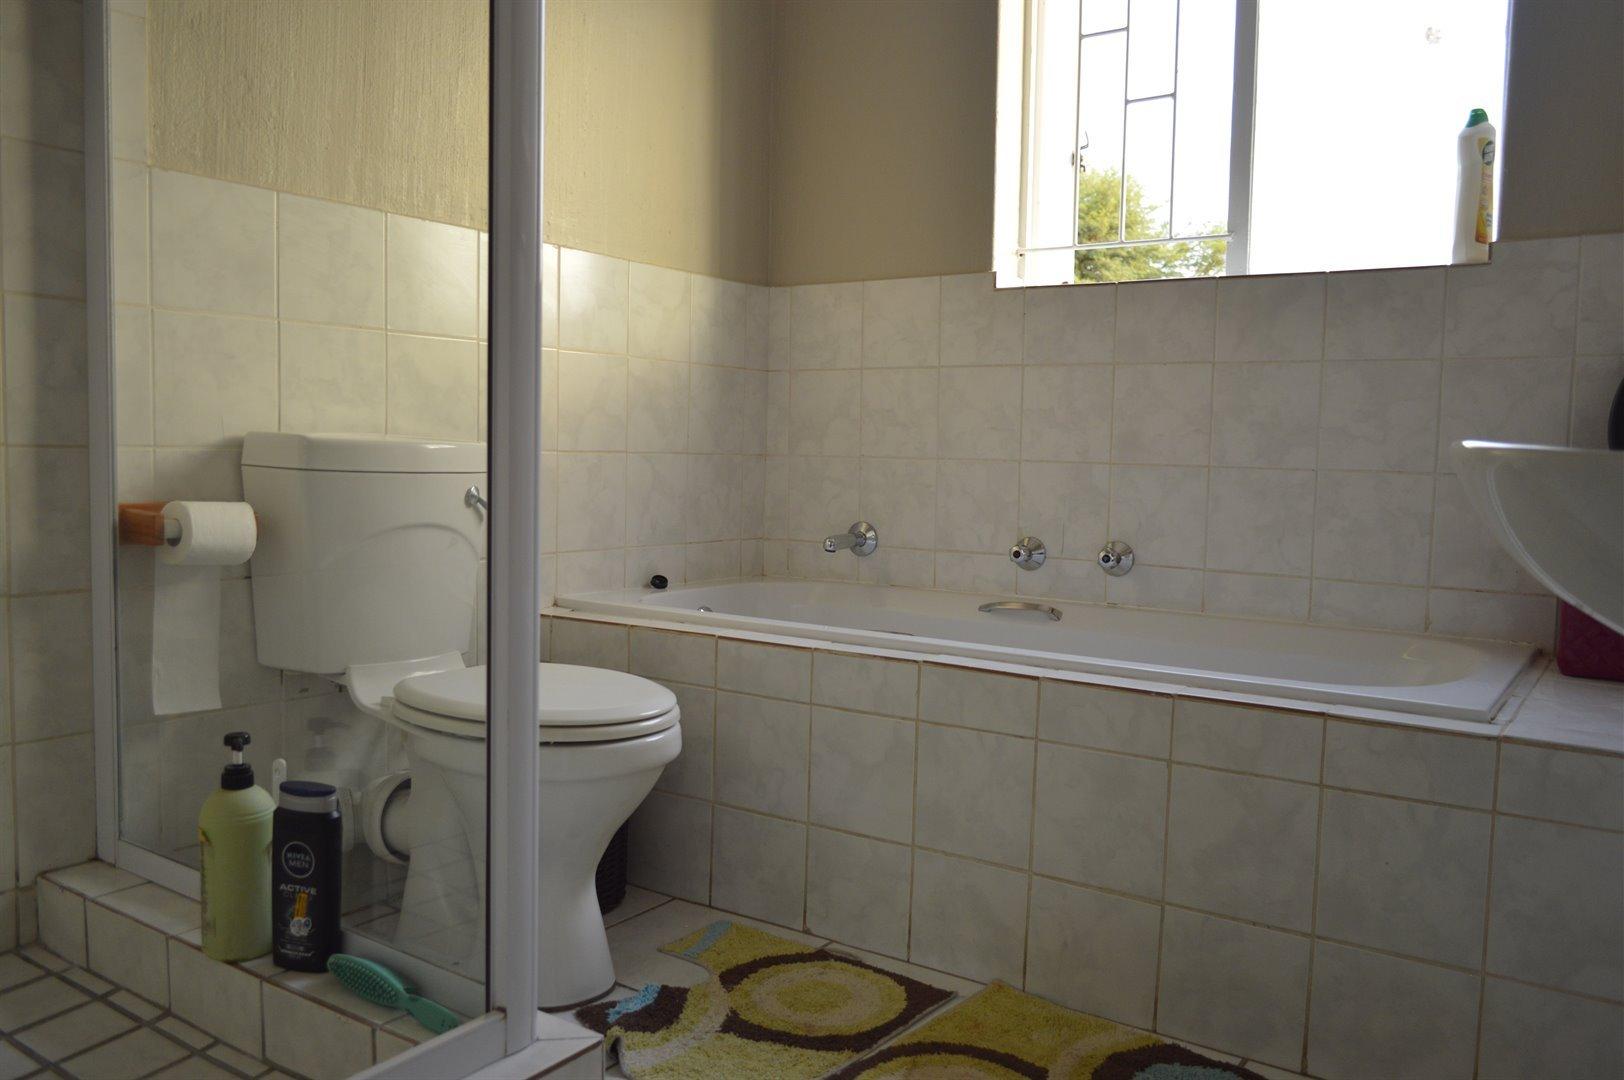 Heuwelsig Estate property for sale. Ref No: 13463647. Picture no 8